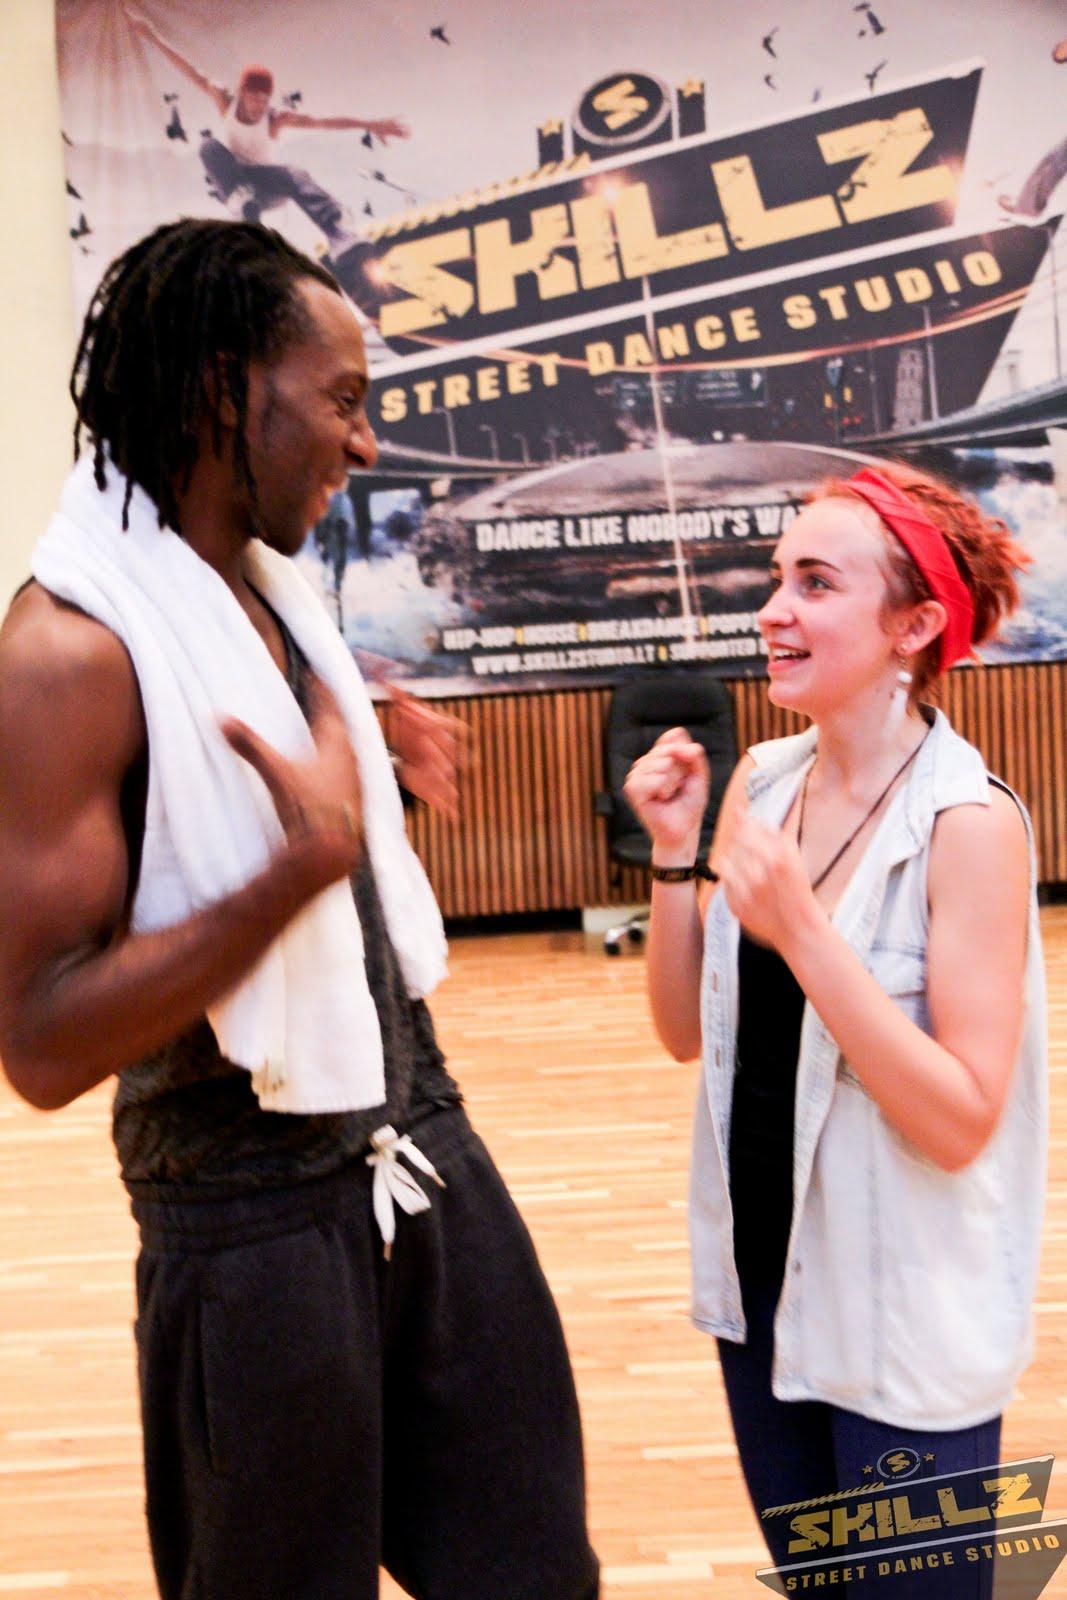 Dancehall workshop with Camron One Shot - IMG_8066.jpg